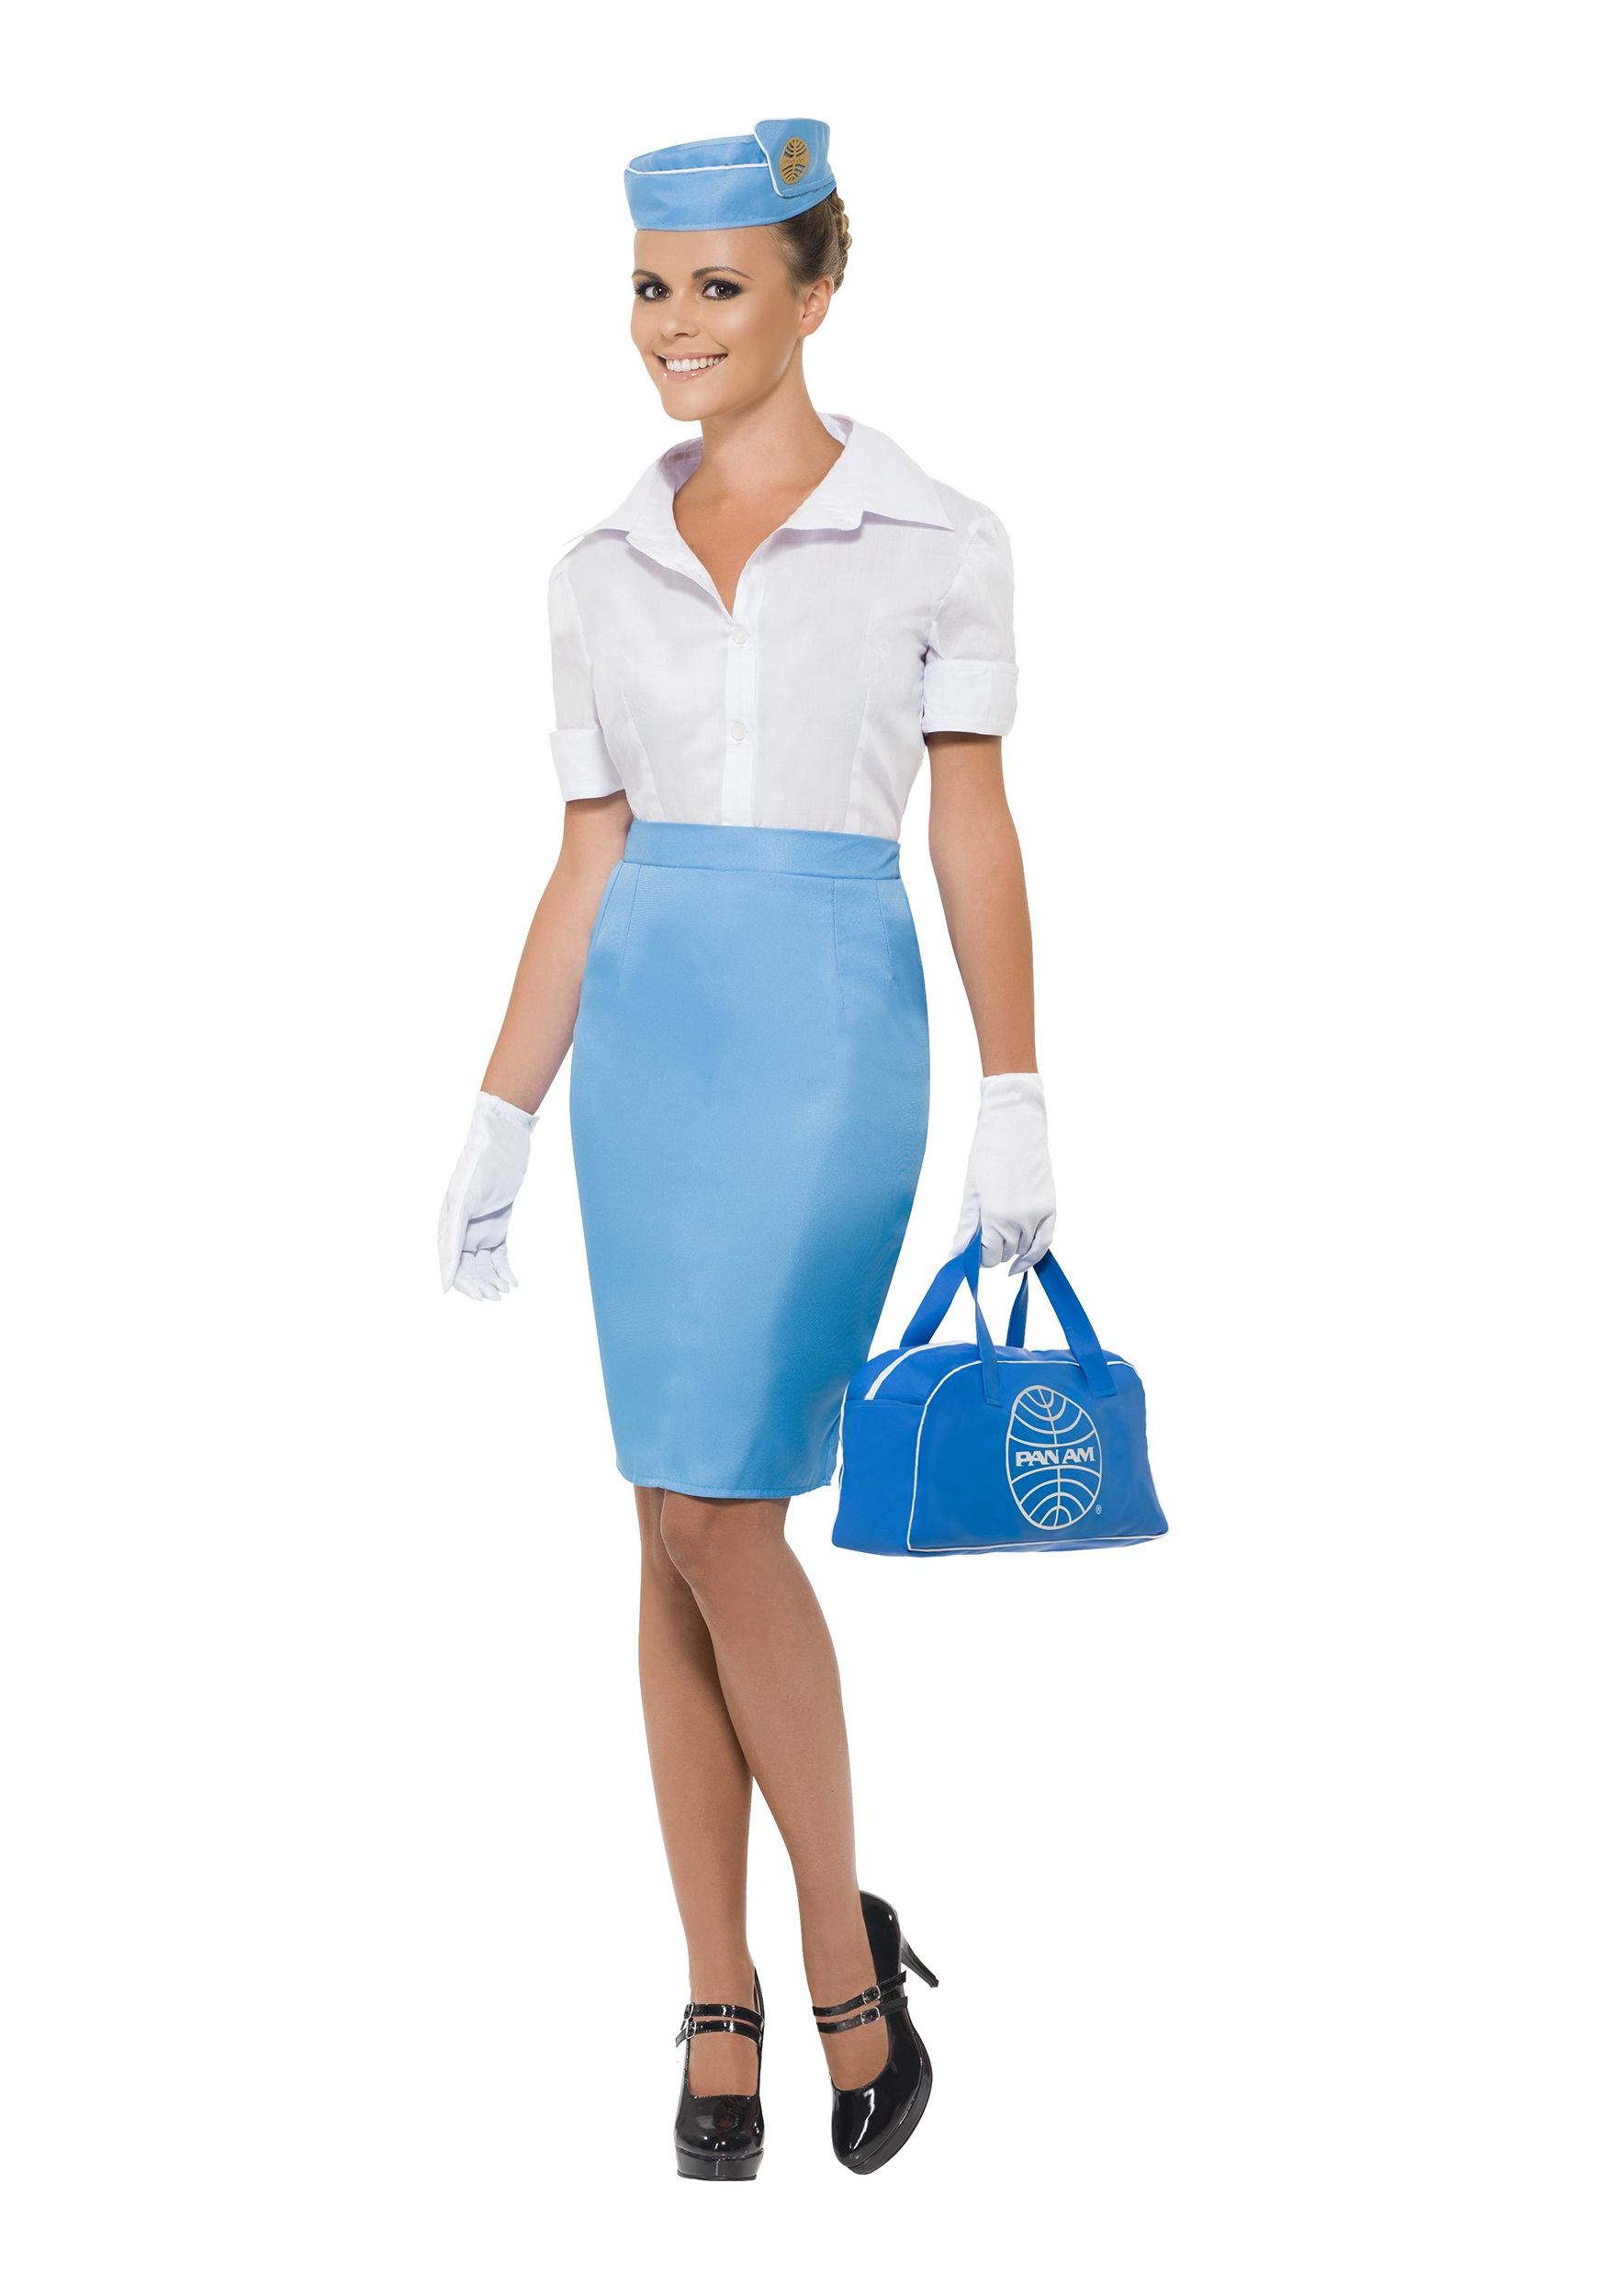 Womenu0027s Pan Am Flight Attendant Costume  sc 1 st  Halloween Costumes & Womenu0027s Pan Am Flight Attendant Costume - Halloween Costumes